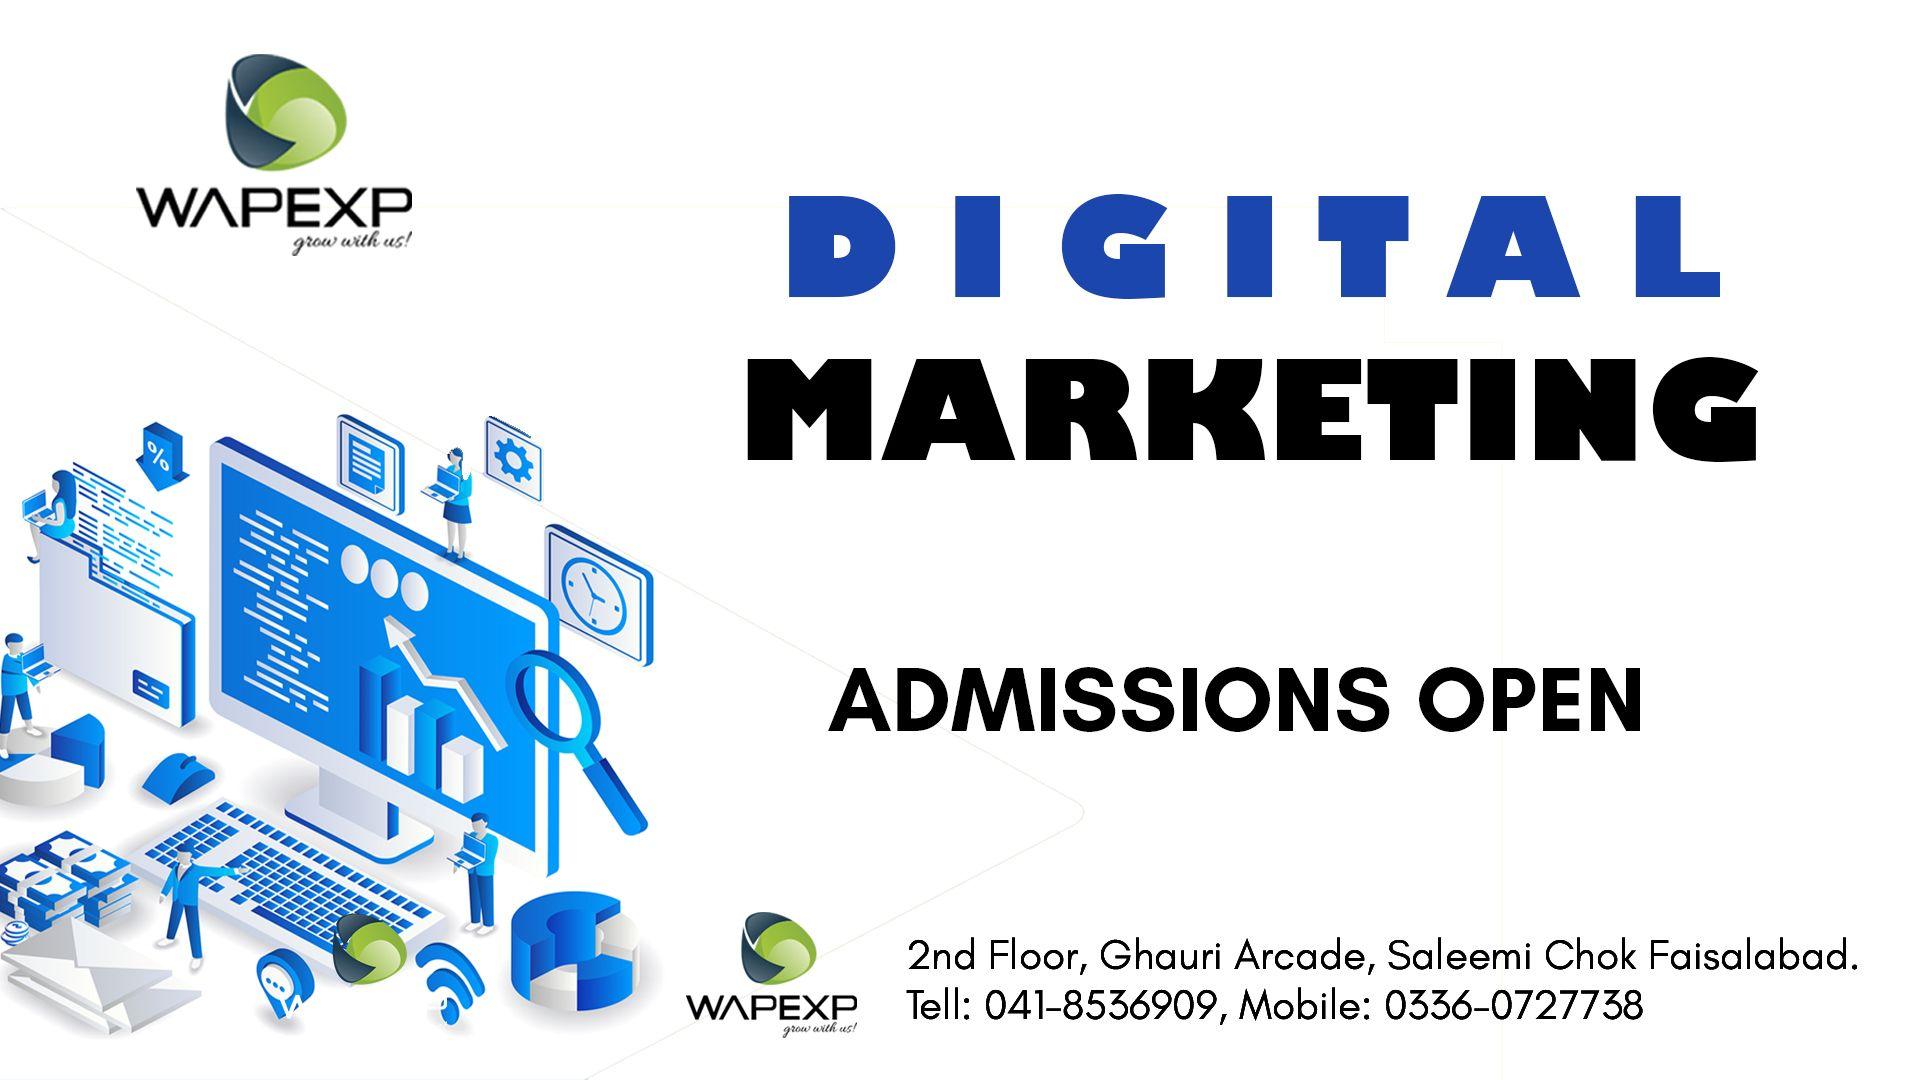 Digital Marketing Add Teacher Career Educational Consultant School Jobs